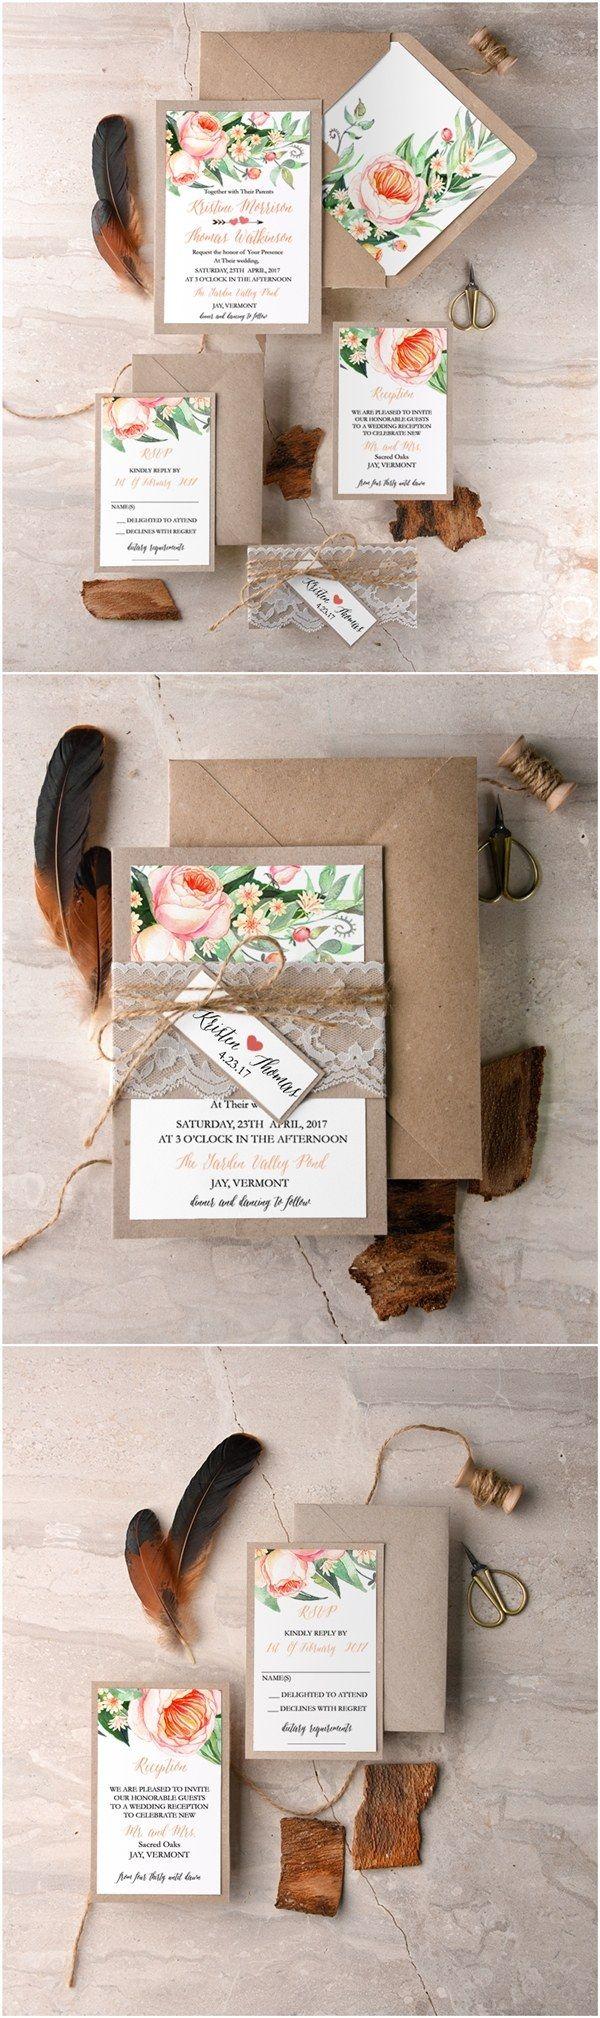 WEDDING INVITATIONS watercolor 1681 best Wedding invitations